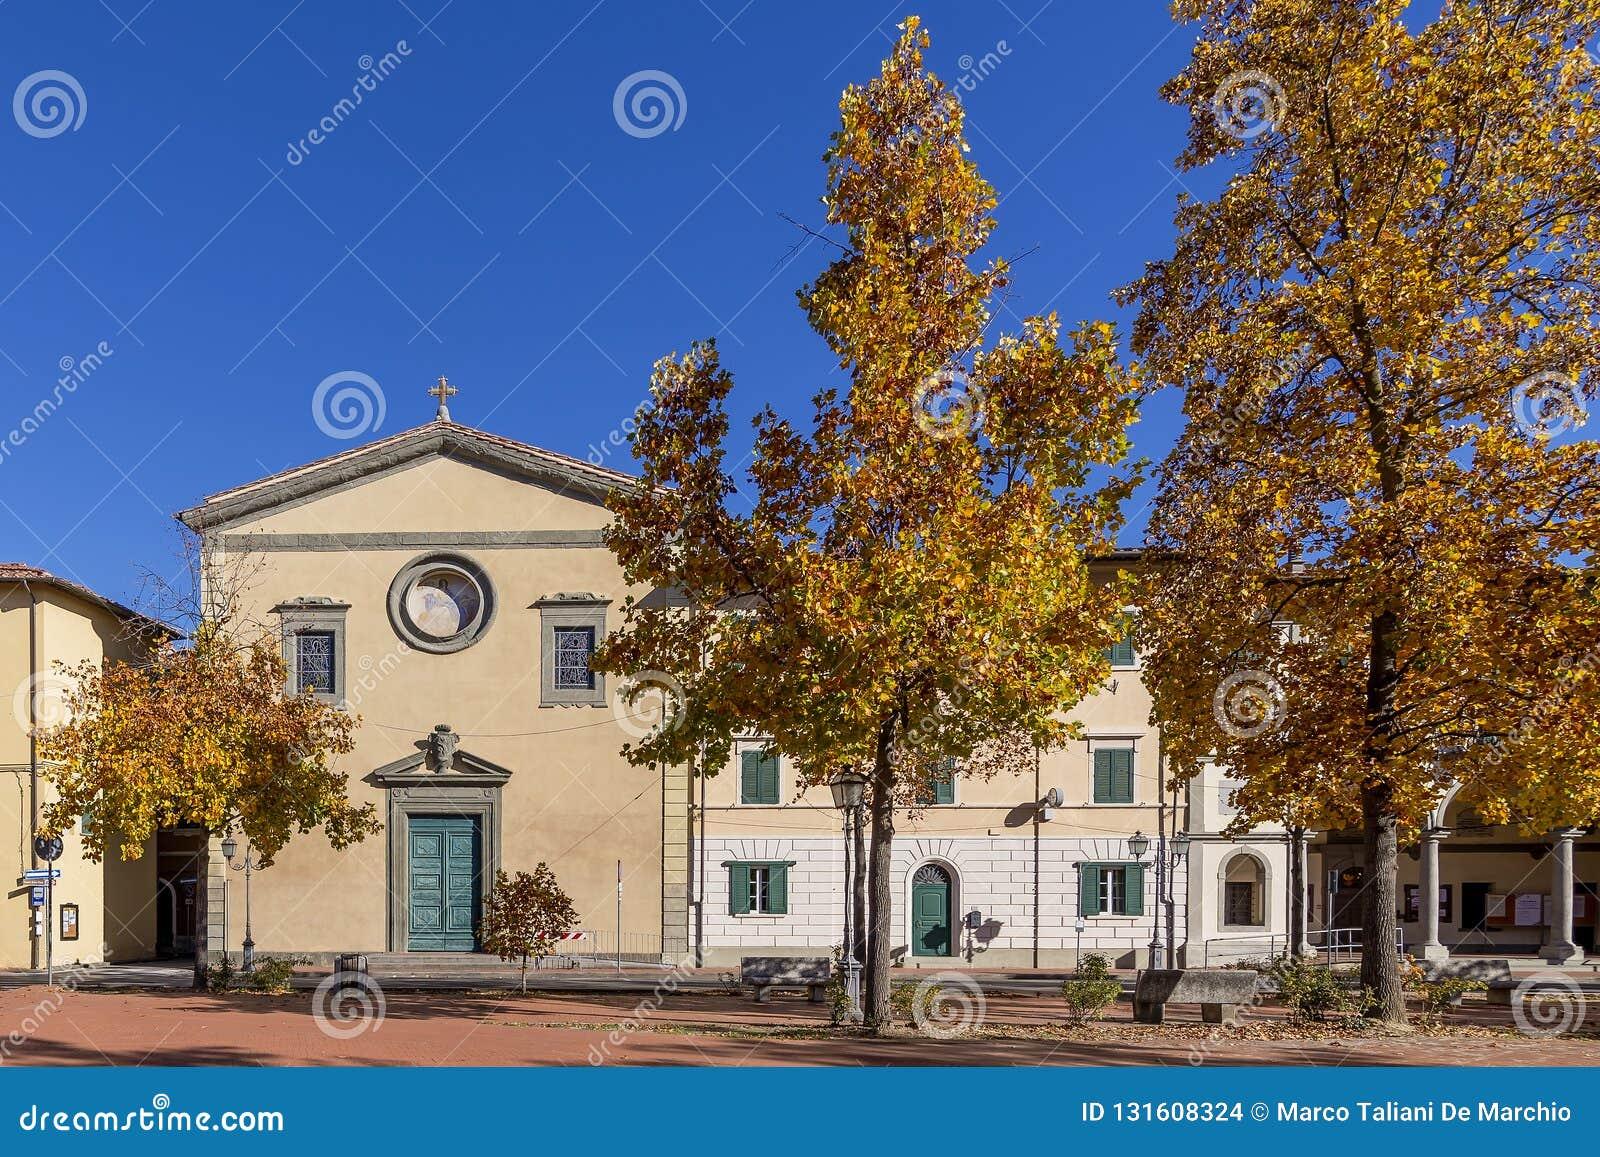 Belle vue d automne de Piazza Vittorio Emanuele II et la paroisse de Santa Maria Assunta dans Bientina, Pise, Italie